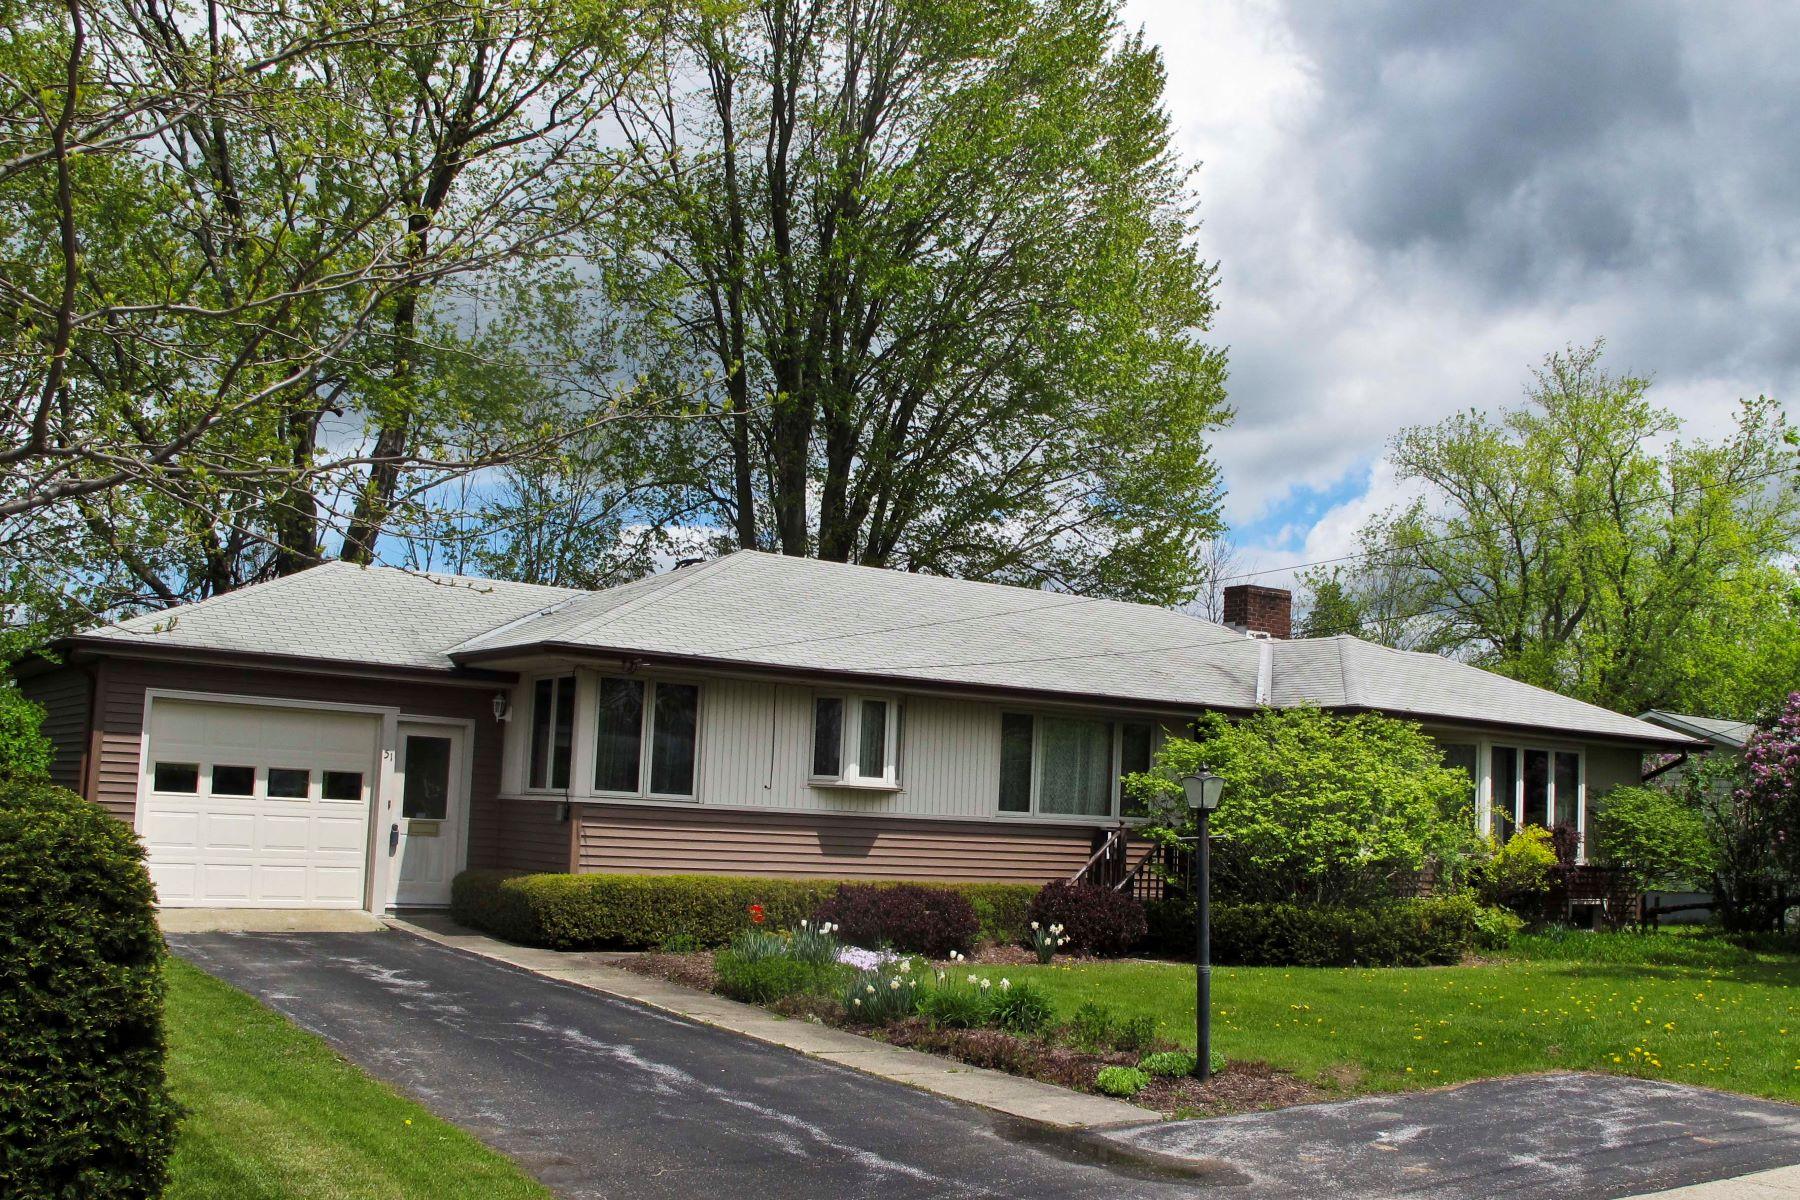 独户住宅 为 销售 在 51 New Haven Road, Vergennes 51 New Haven Rd 弗尔琴尼斯, 佛蒙特州, 05491 美国